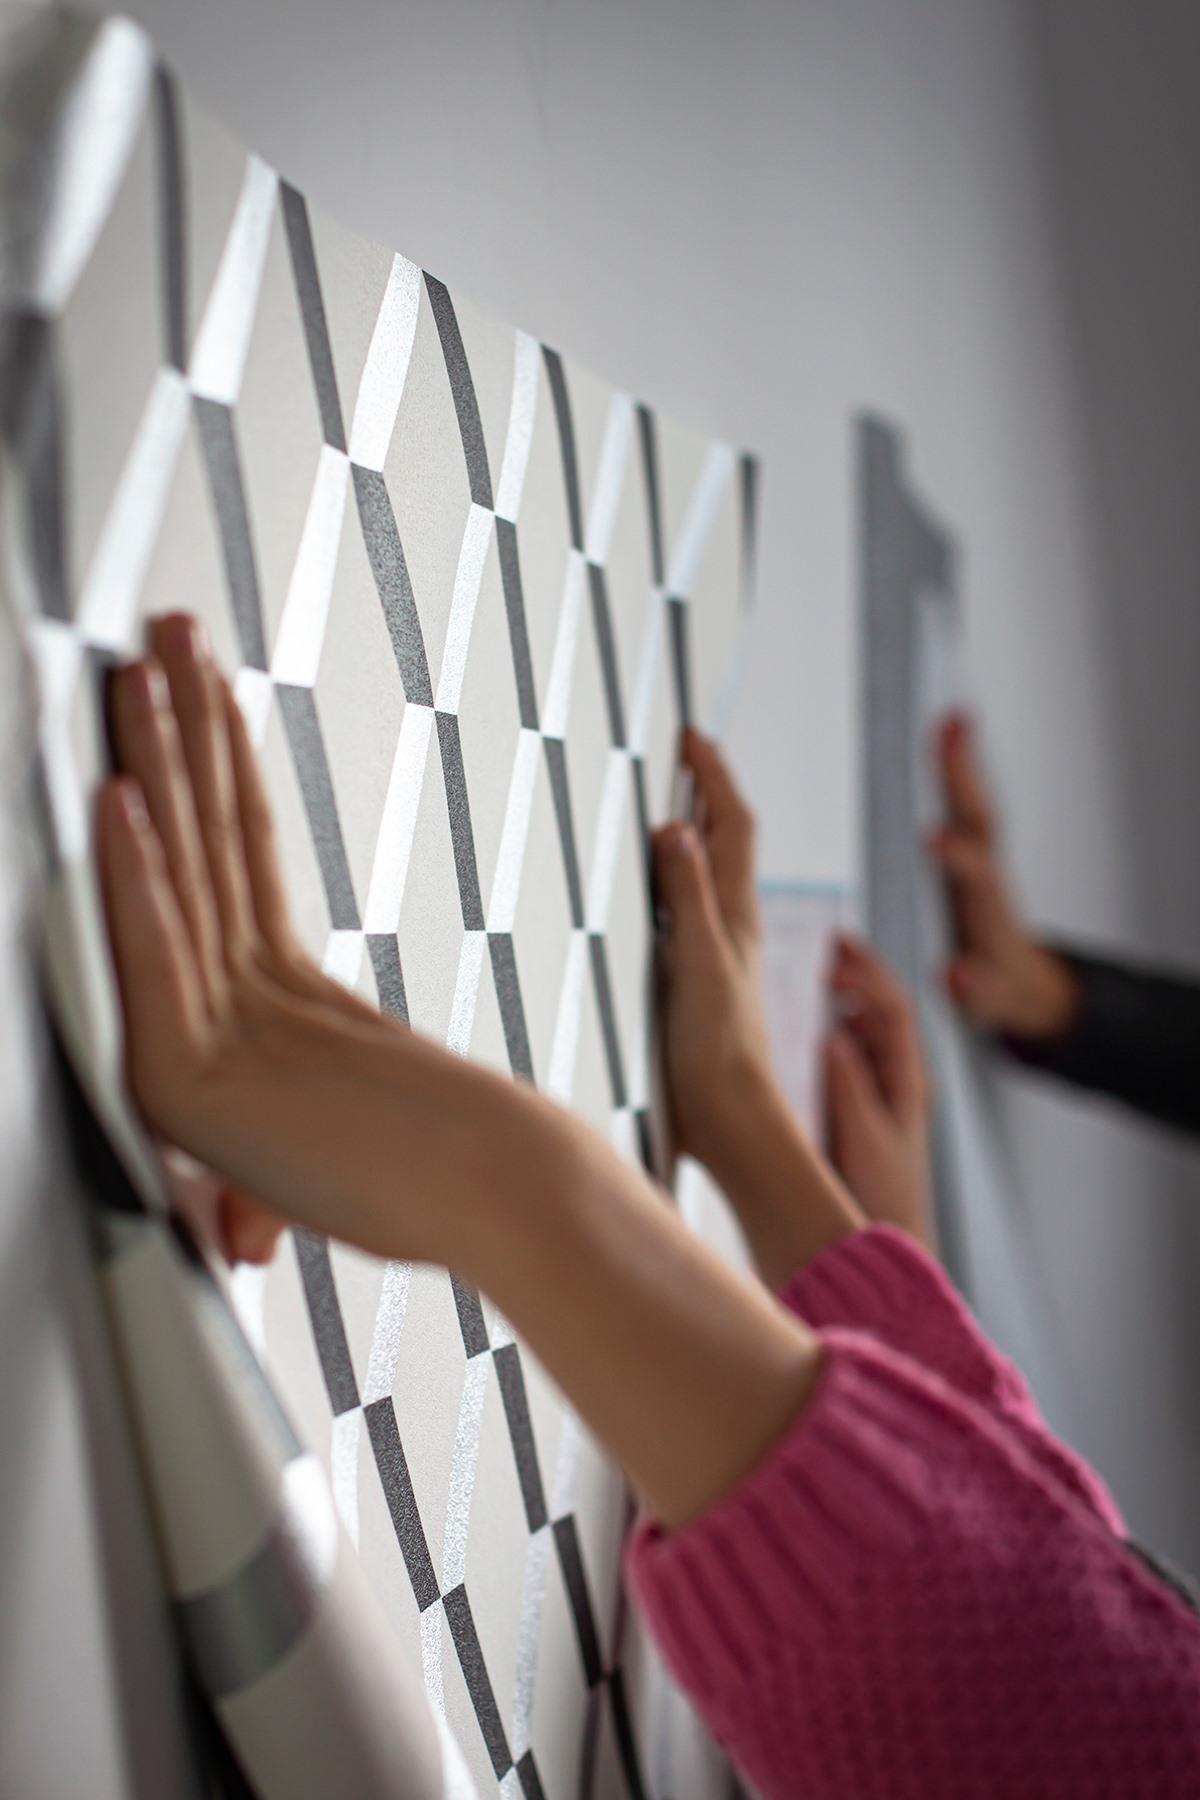 mieszkanie wzory na ścianach